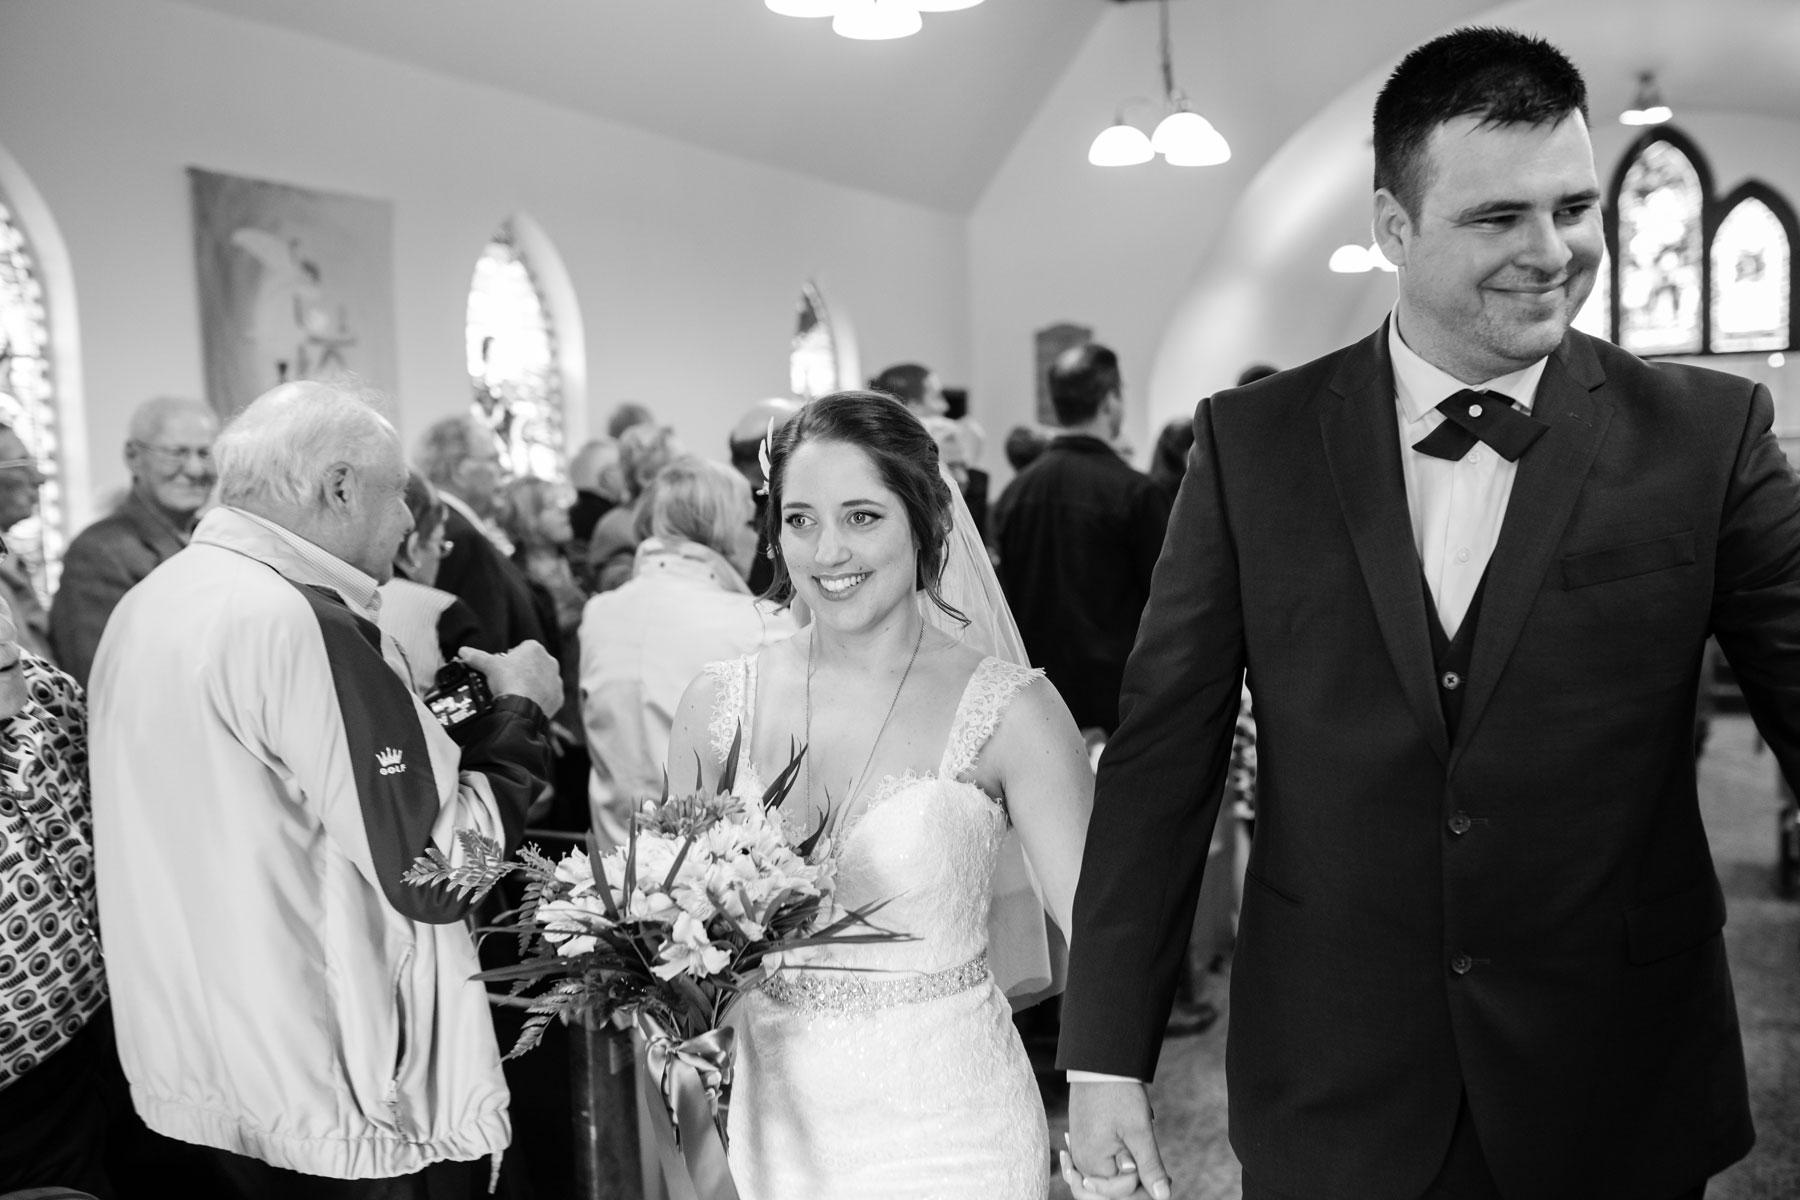 Angela & Patrick - Lacombe, Alberta Wedding Photography - Olson Studios (15)